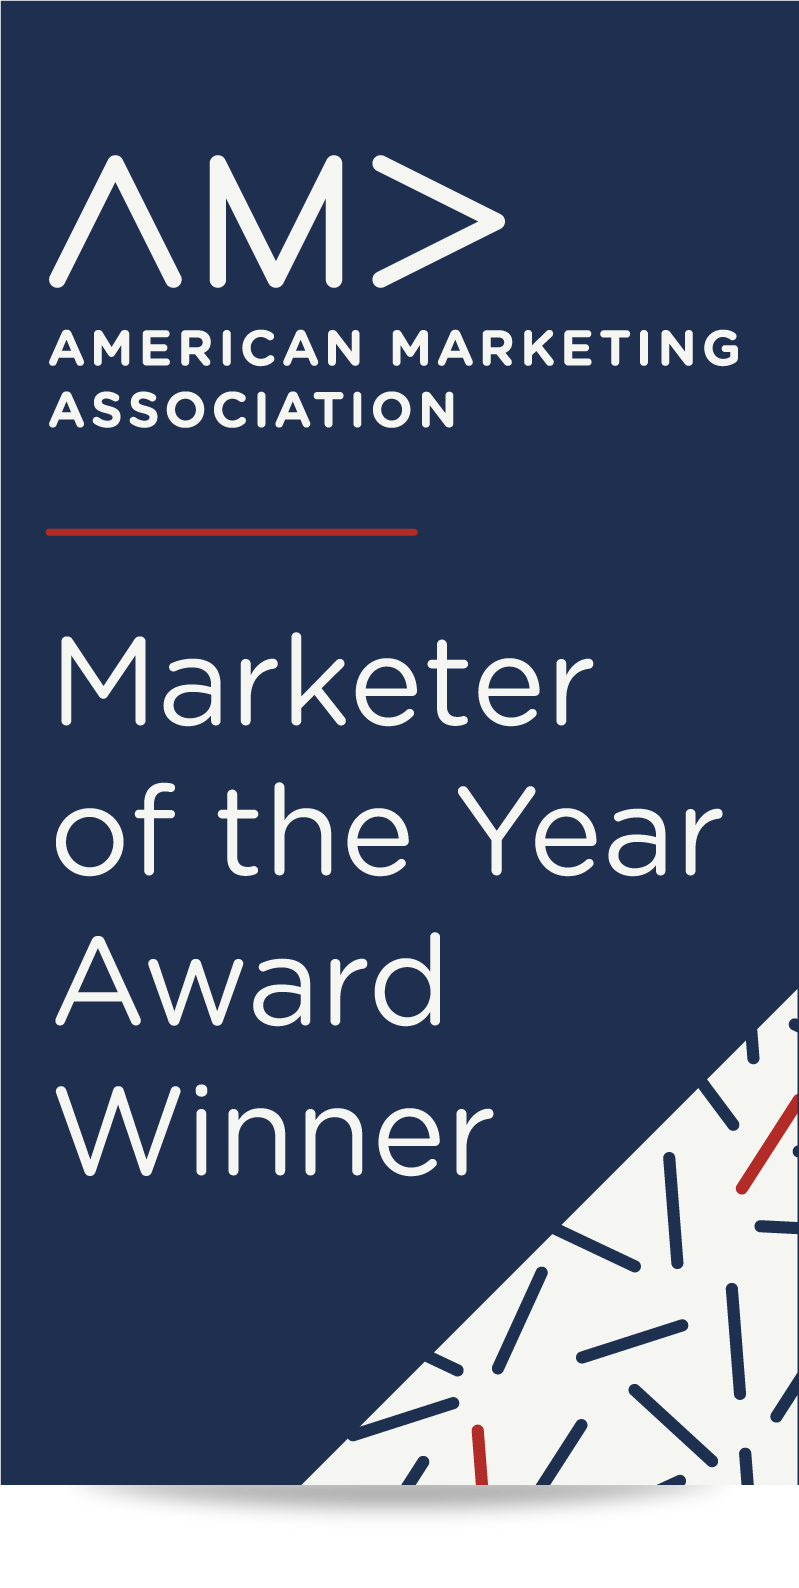 Dallas-Fort Worth American Marketing Association Marketer of the Year Award Winner Badge